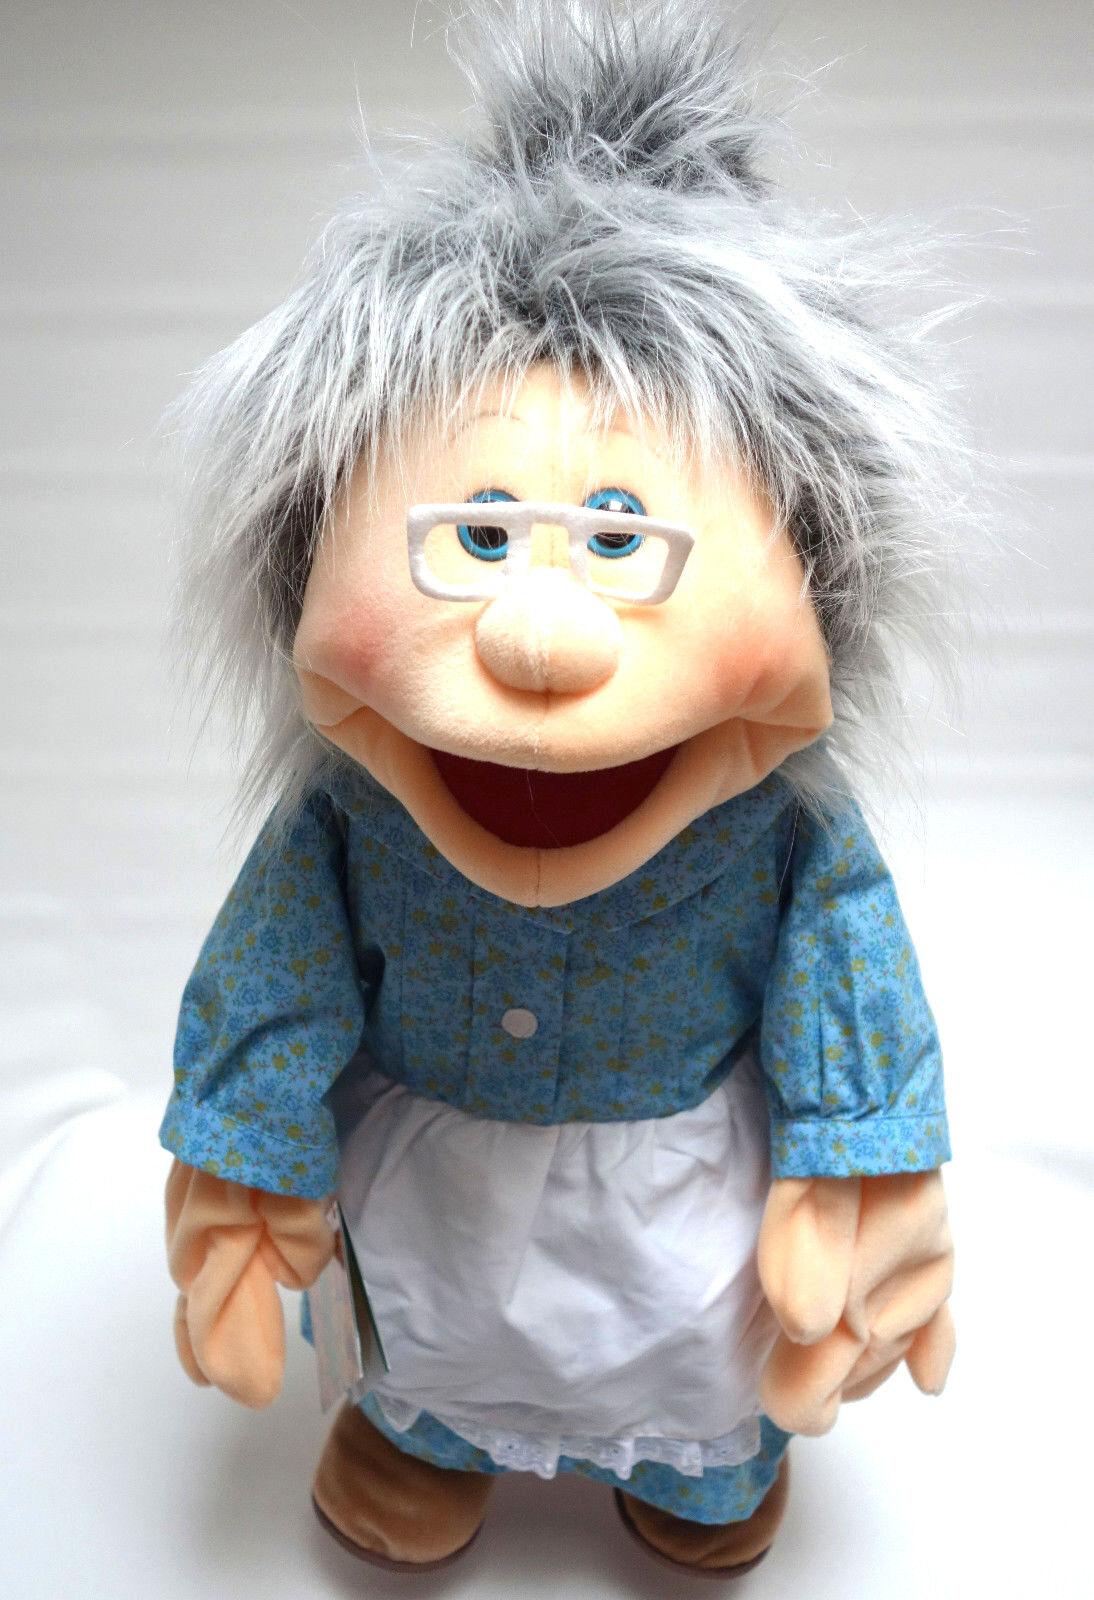 Living Puppets mano muñeca abuela abuela aprox. 65 cm de nuevo